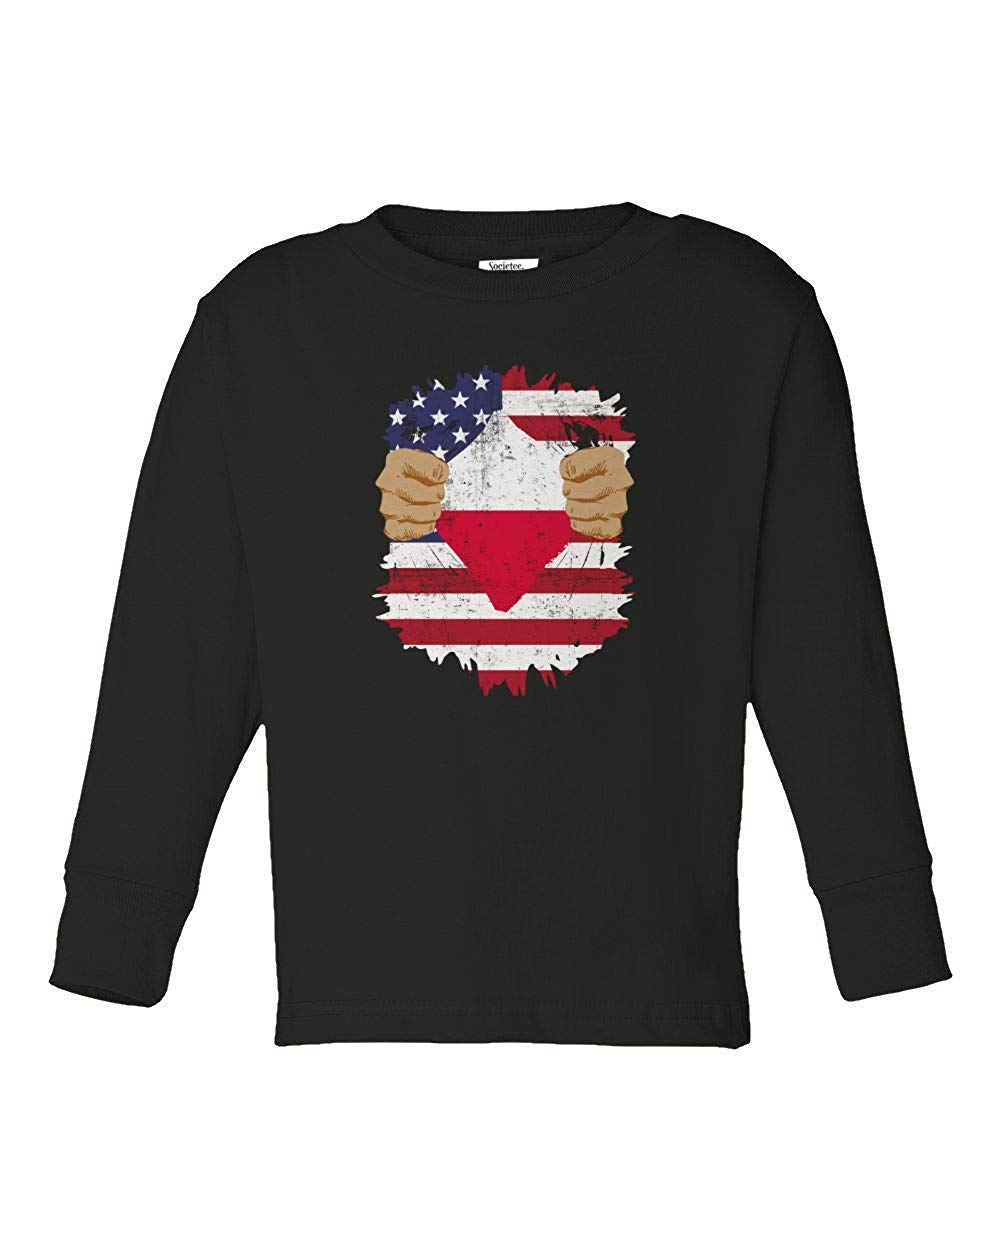 02efc1ec4 Societee Polish American USA Poland Pride Flag Youth   Toddler Long Sleeve  Tee Shirt